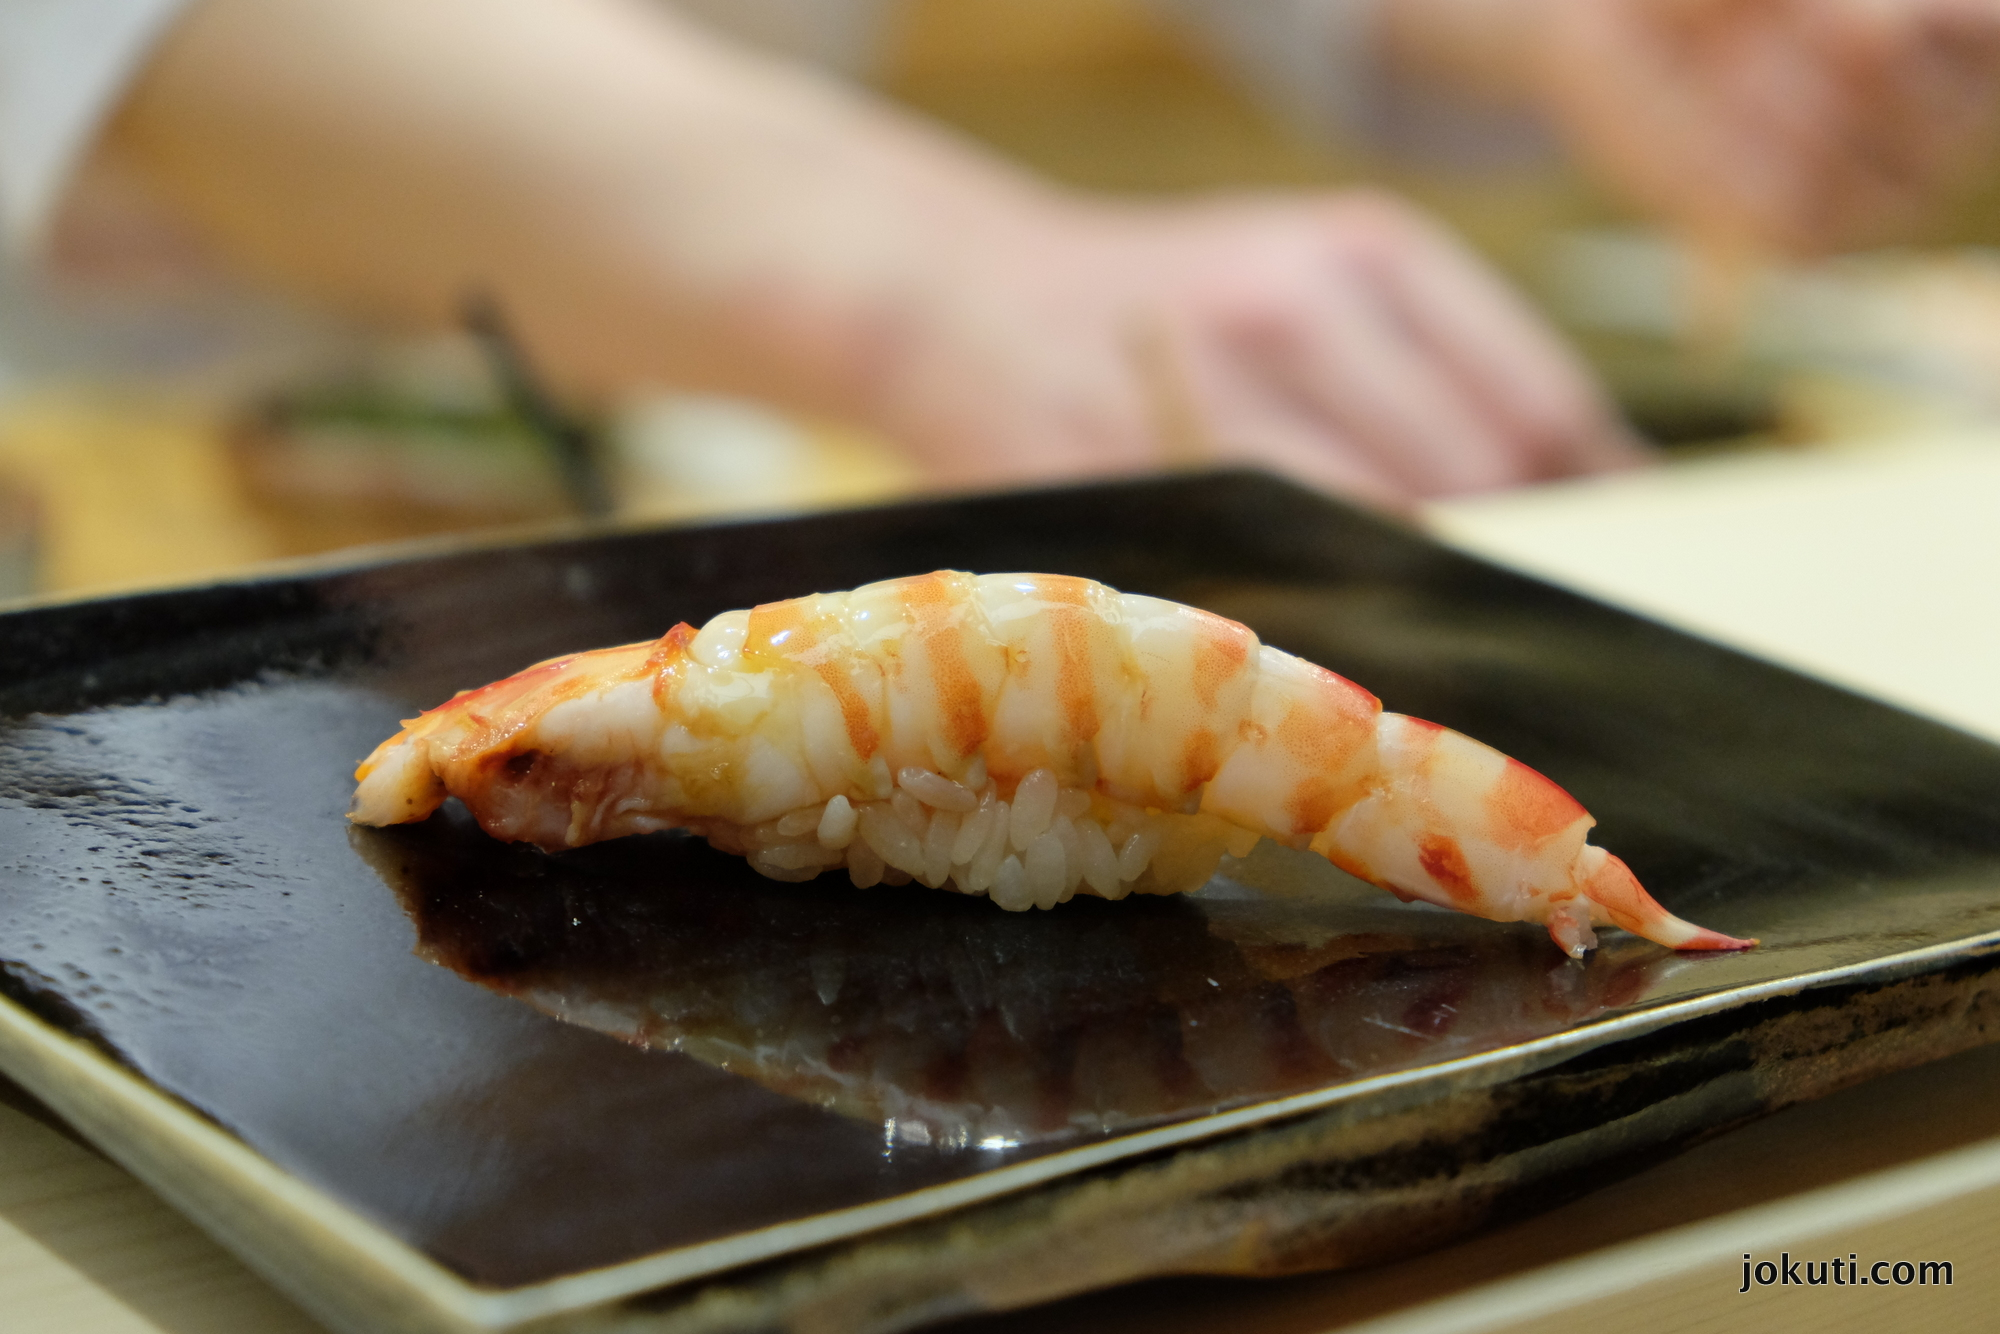 dscf5639_sugita_sushi_michelin_tokyo_japan_vilagevo_jokuti.jpg